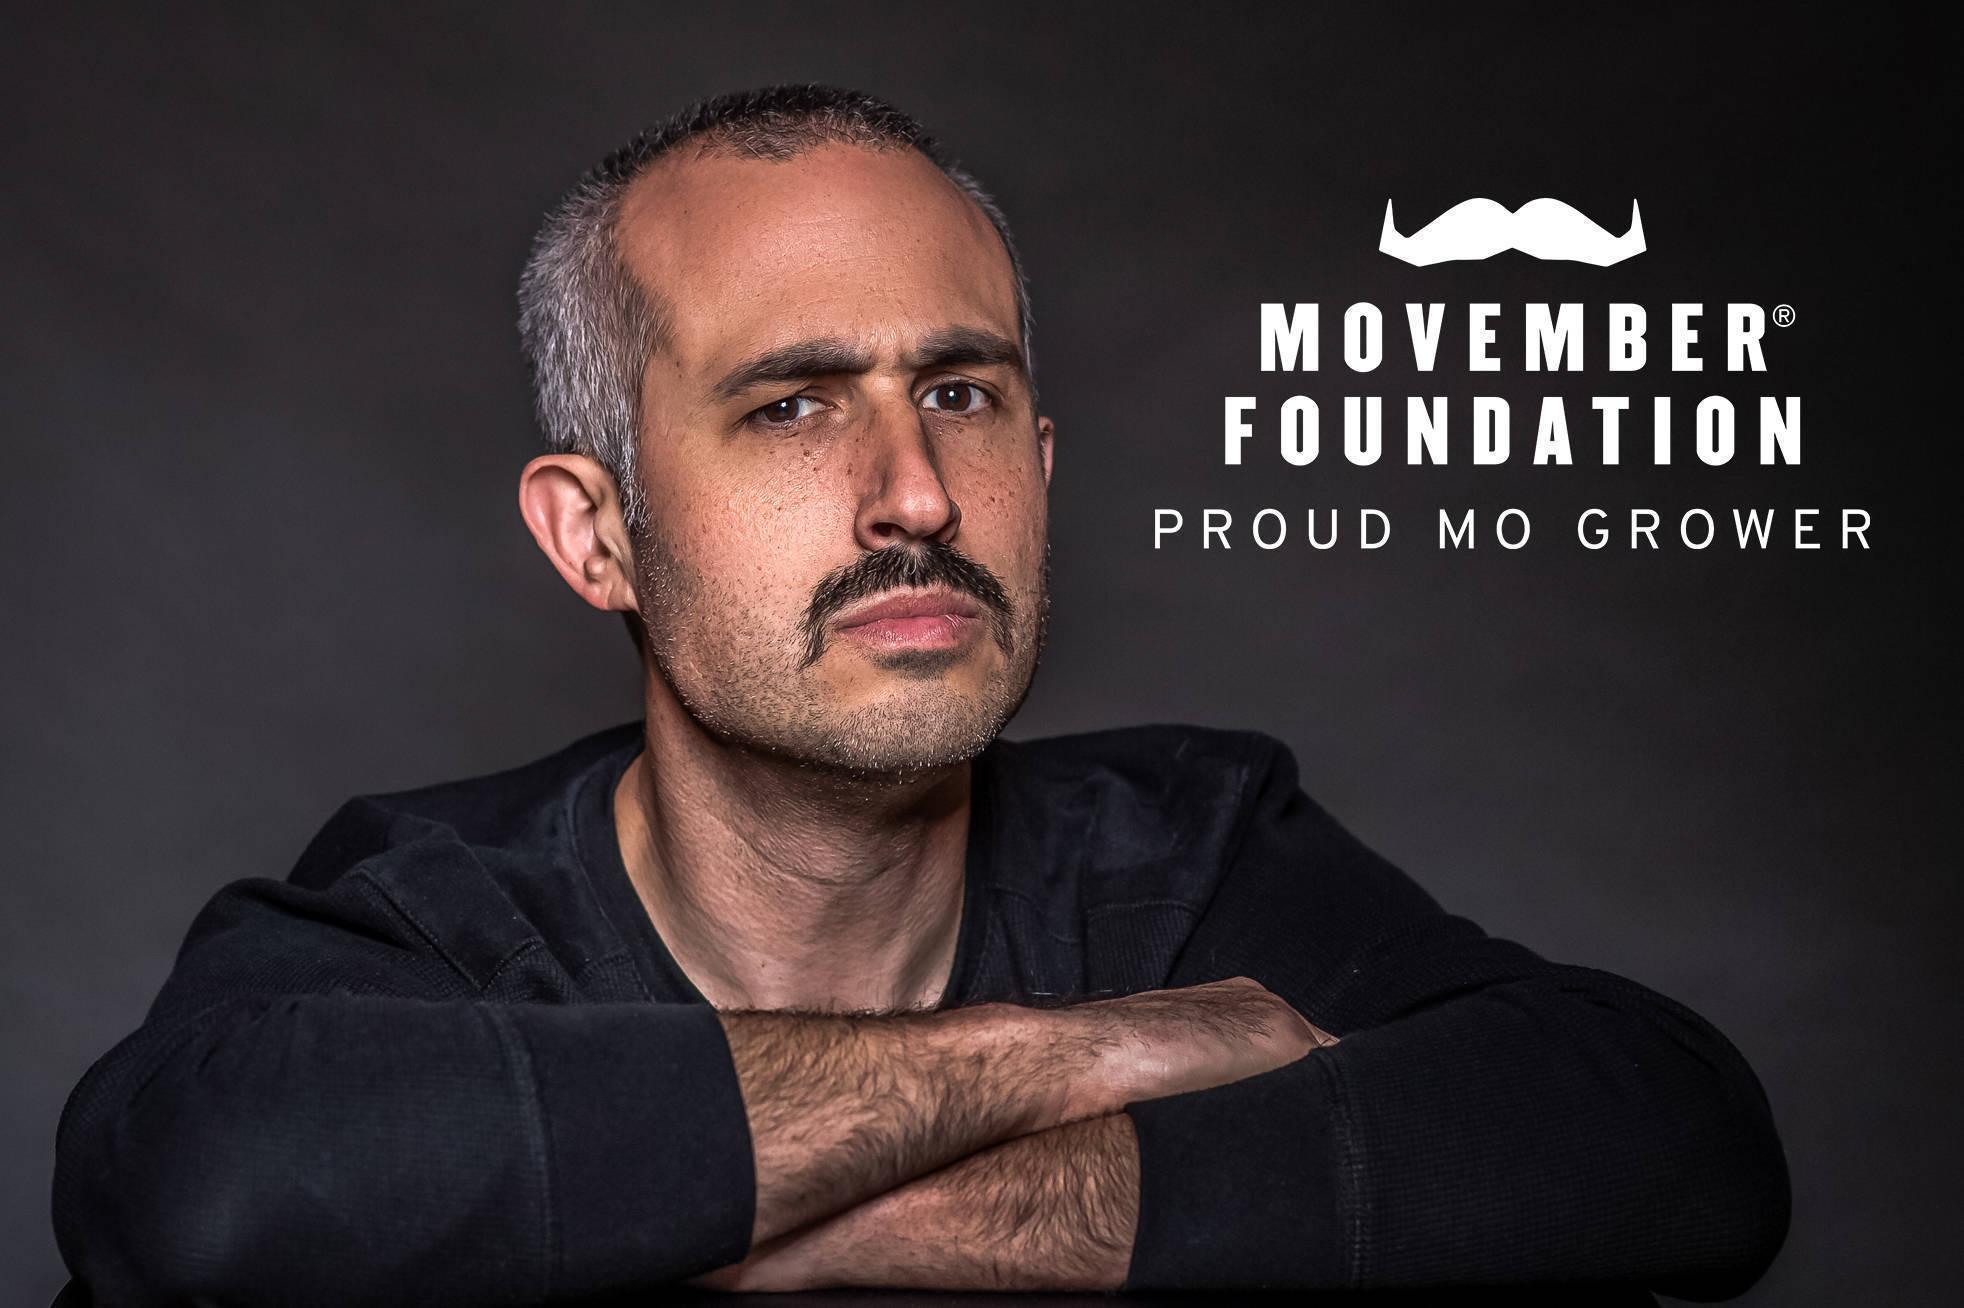 Perry_Movember-003 copy copy.jpg